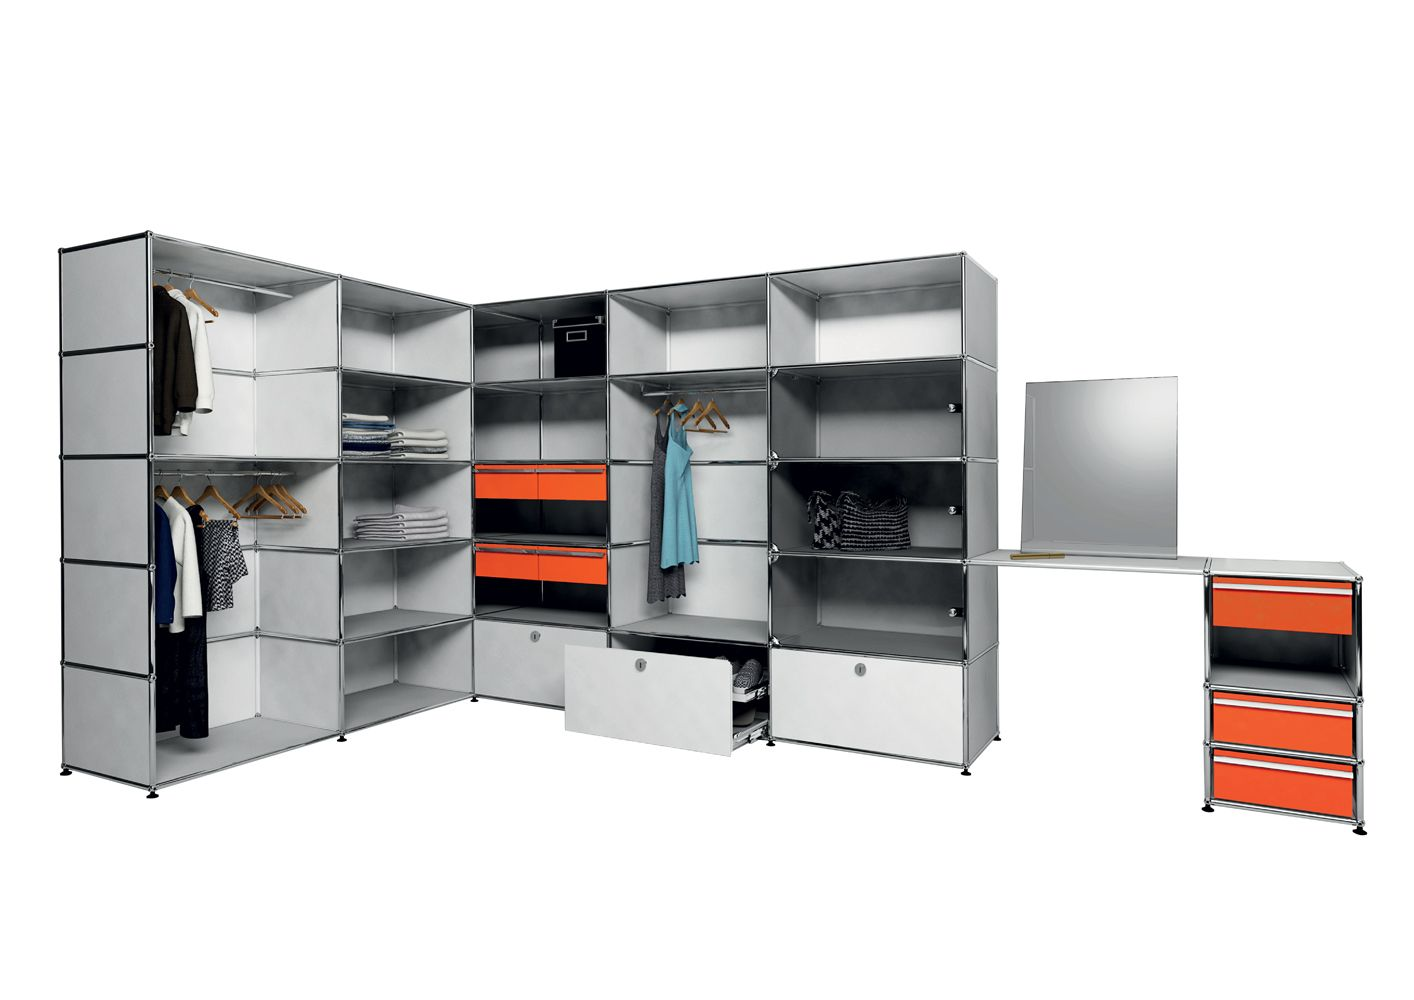 USM modular furniture wardrobe light gray  orange meuble USM Haller dressing gris clair